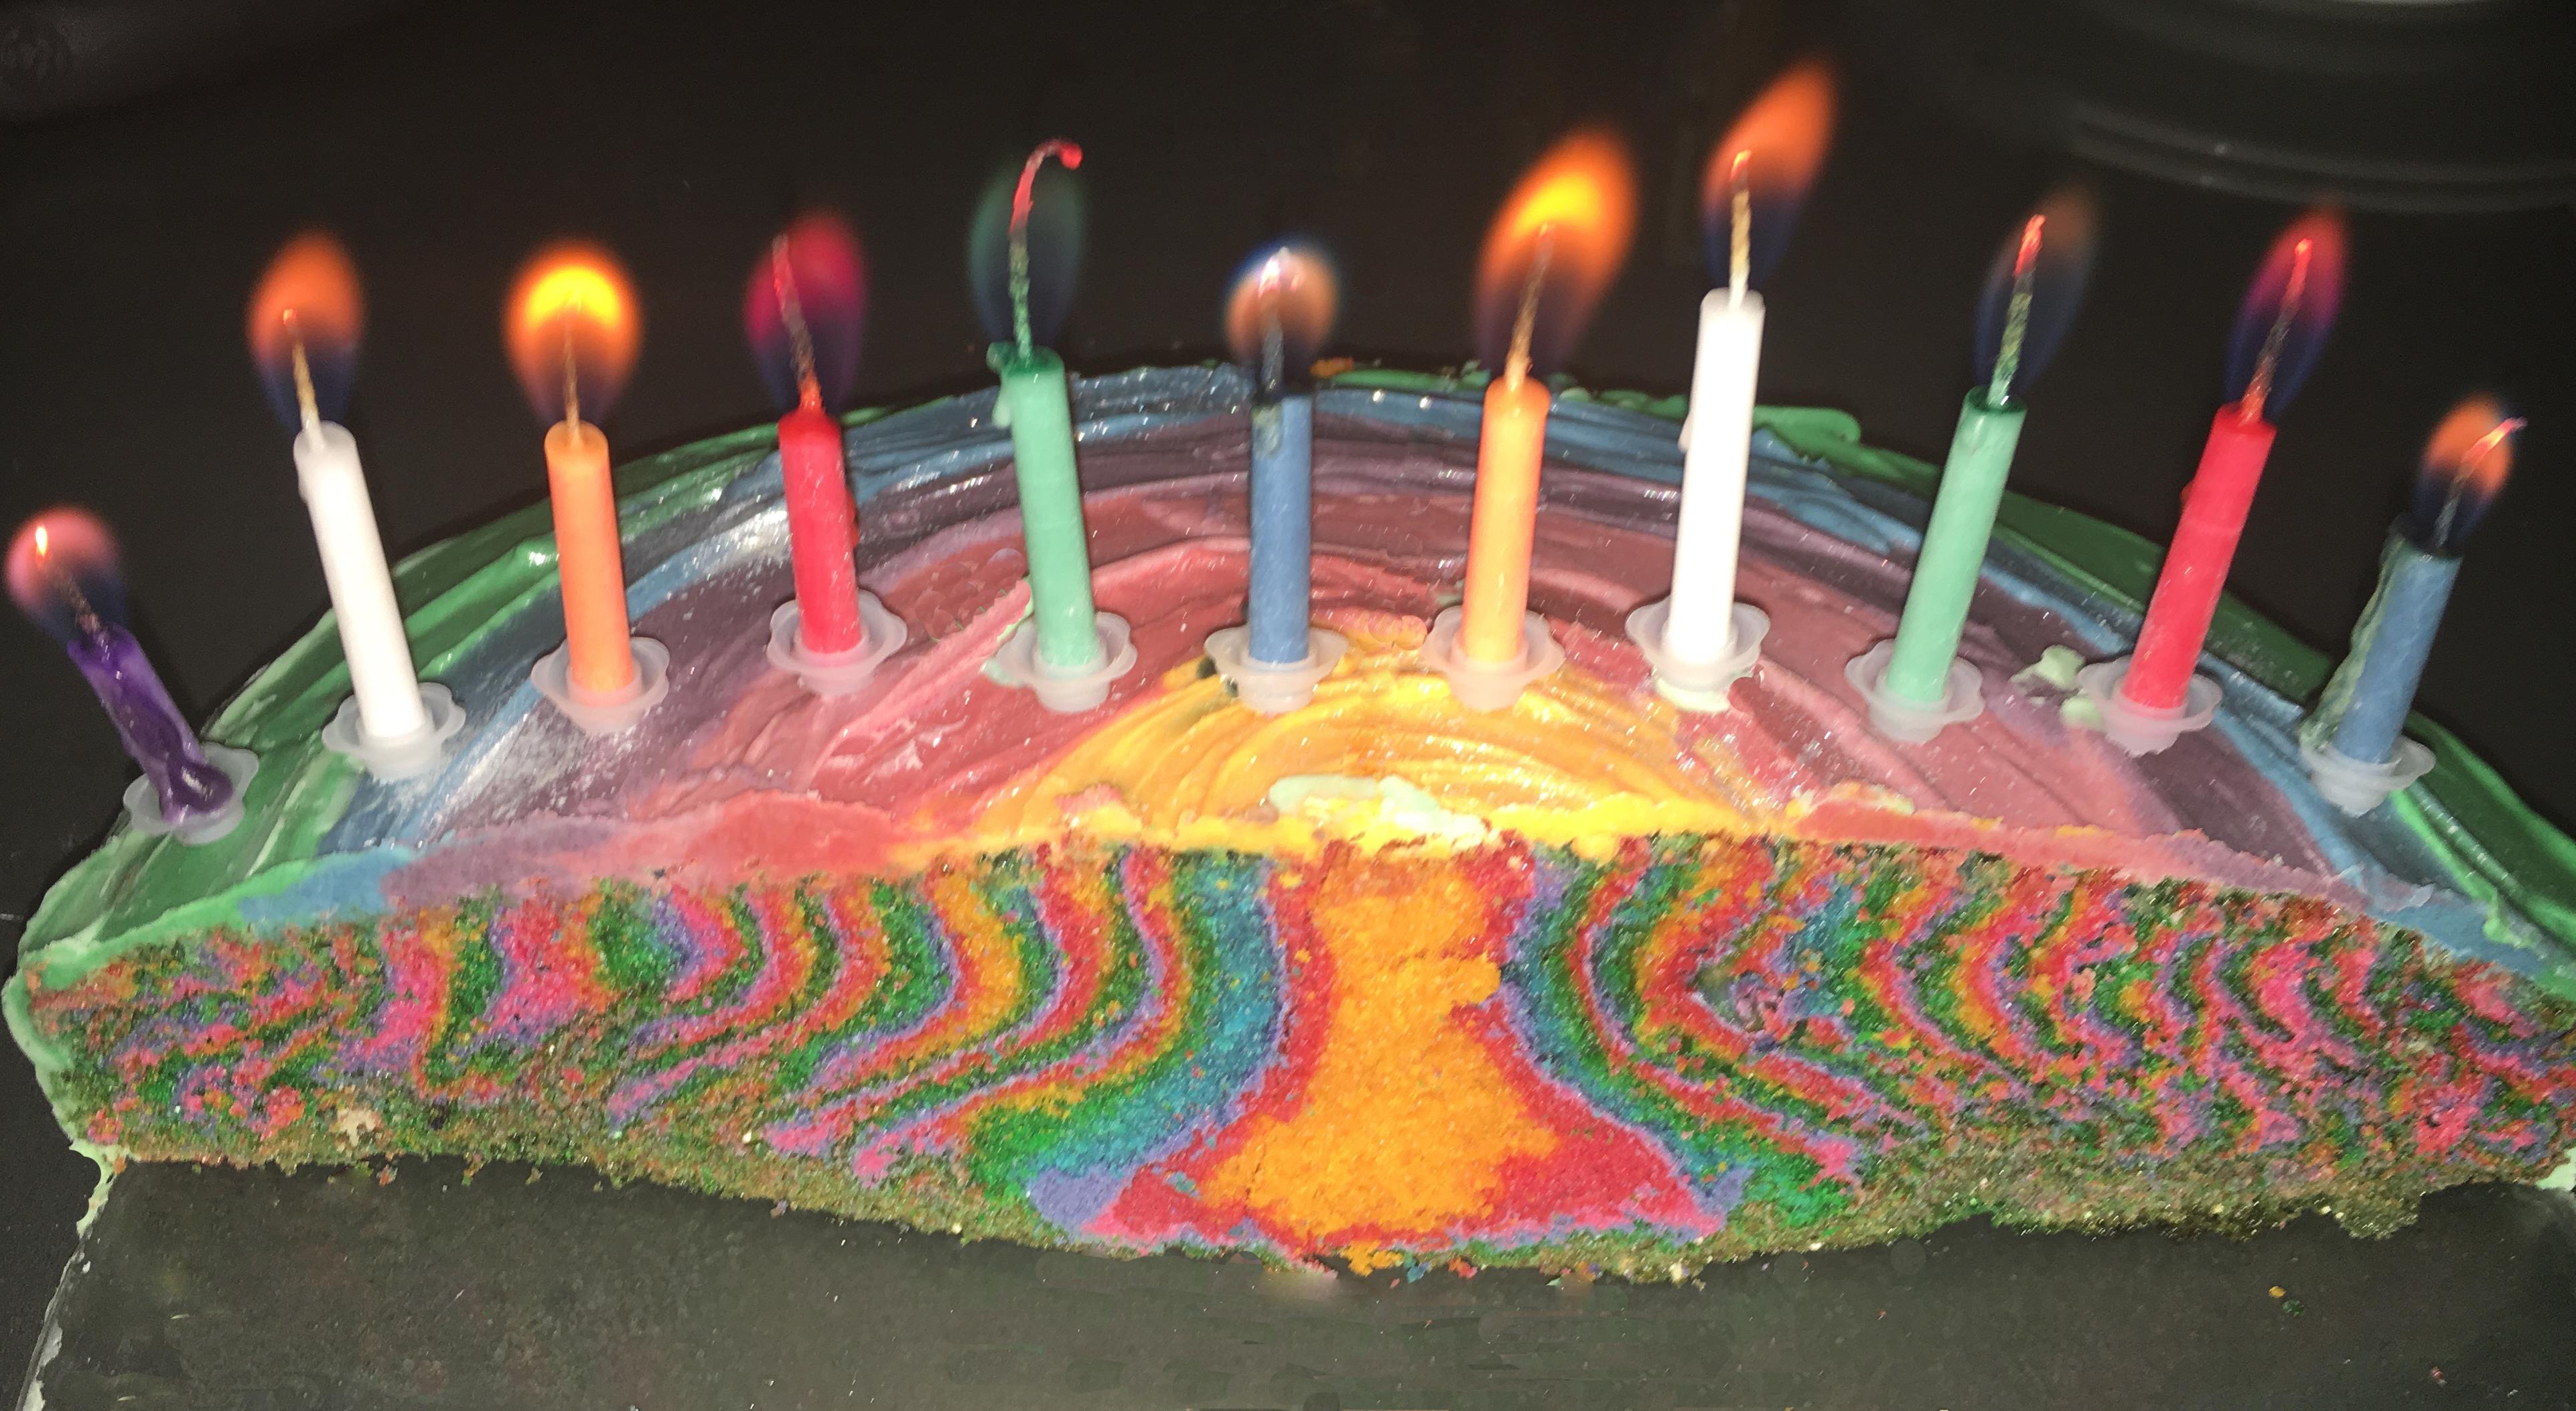 Regenbogen / Lego Kuchen